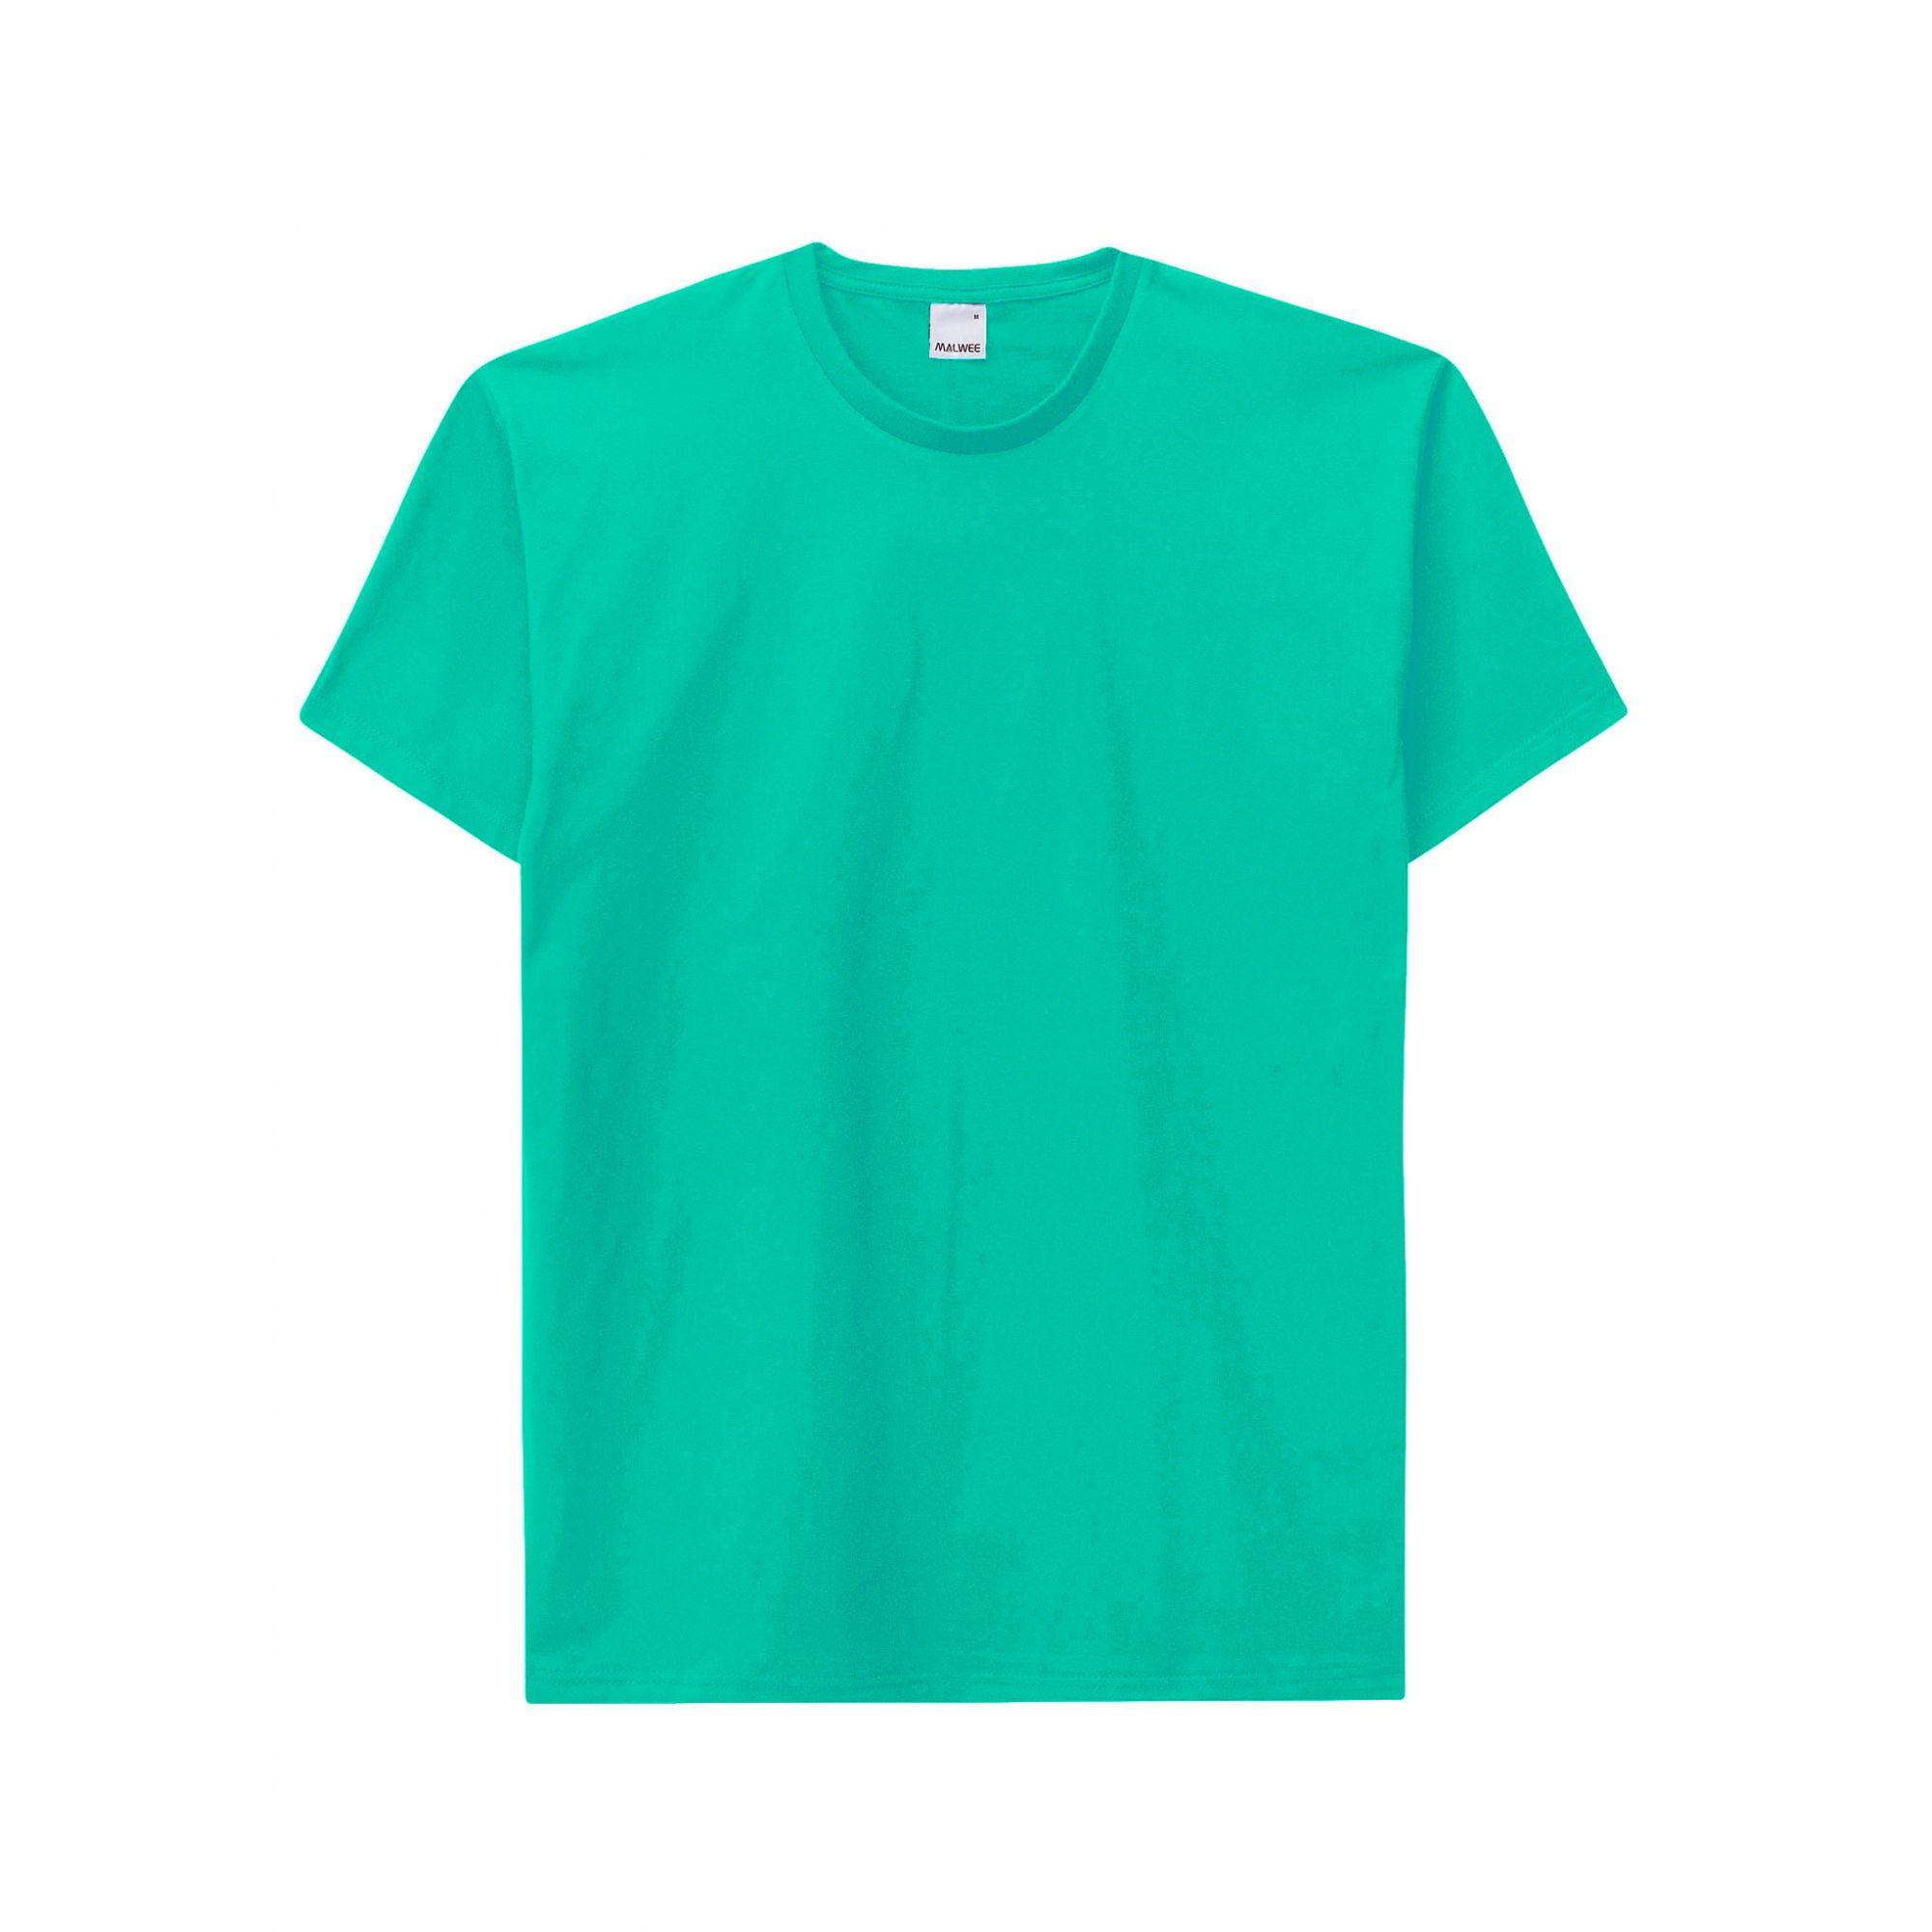 Camiseta ADULTO Masculina Verão Verde Malwee